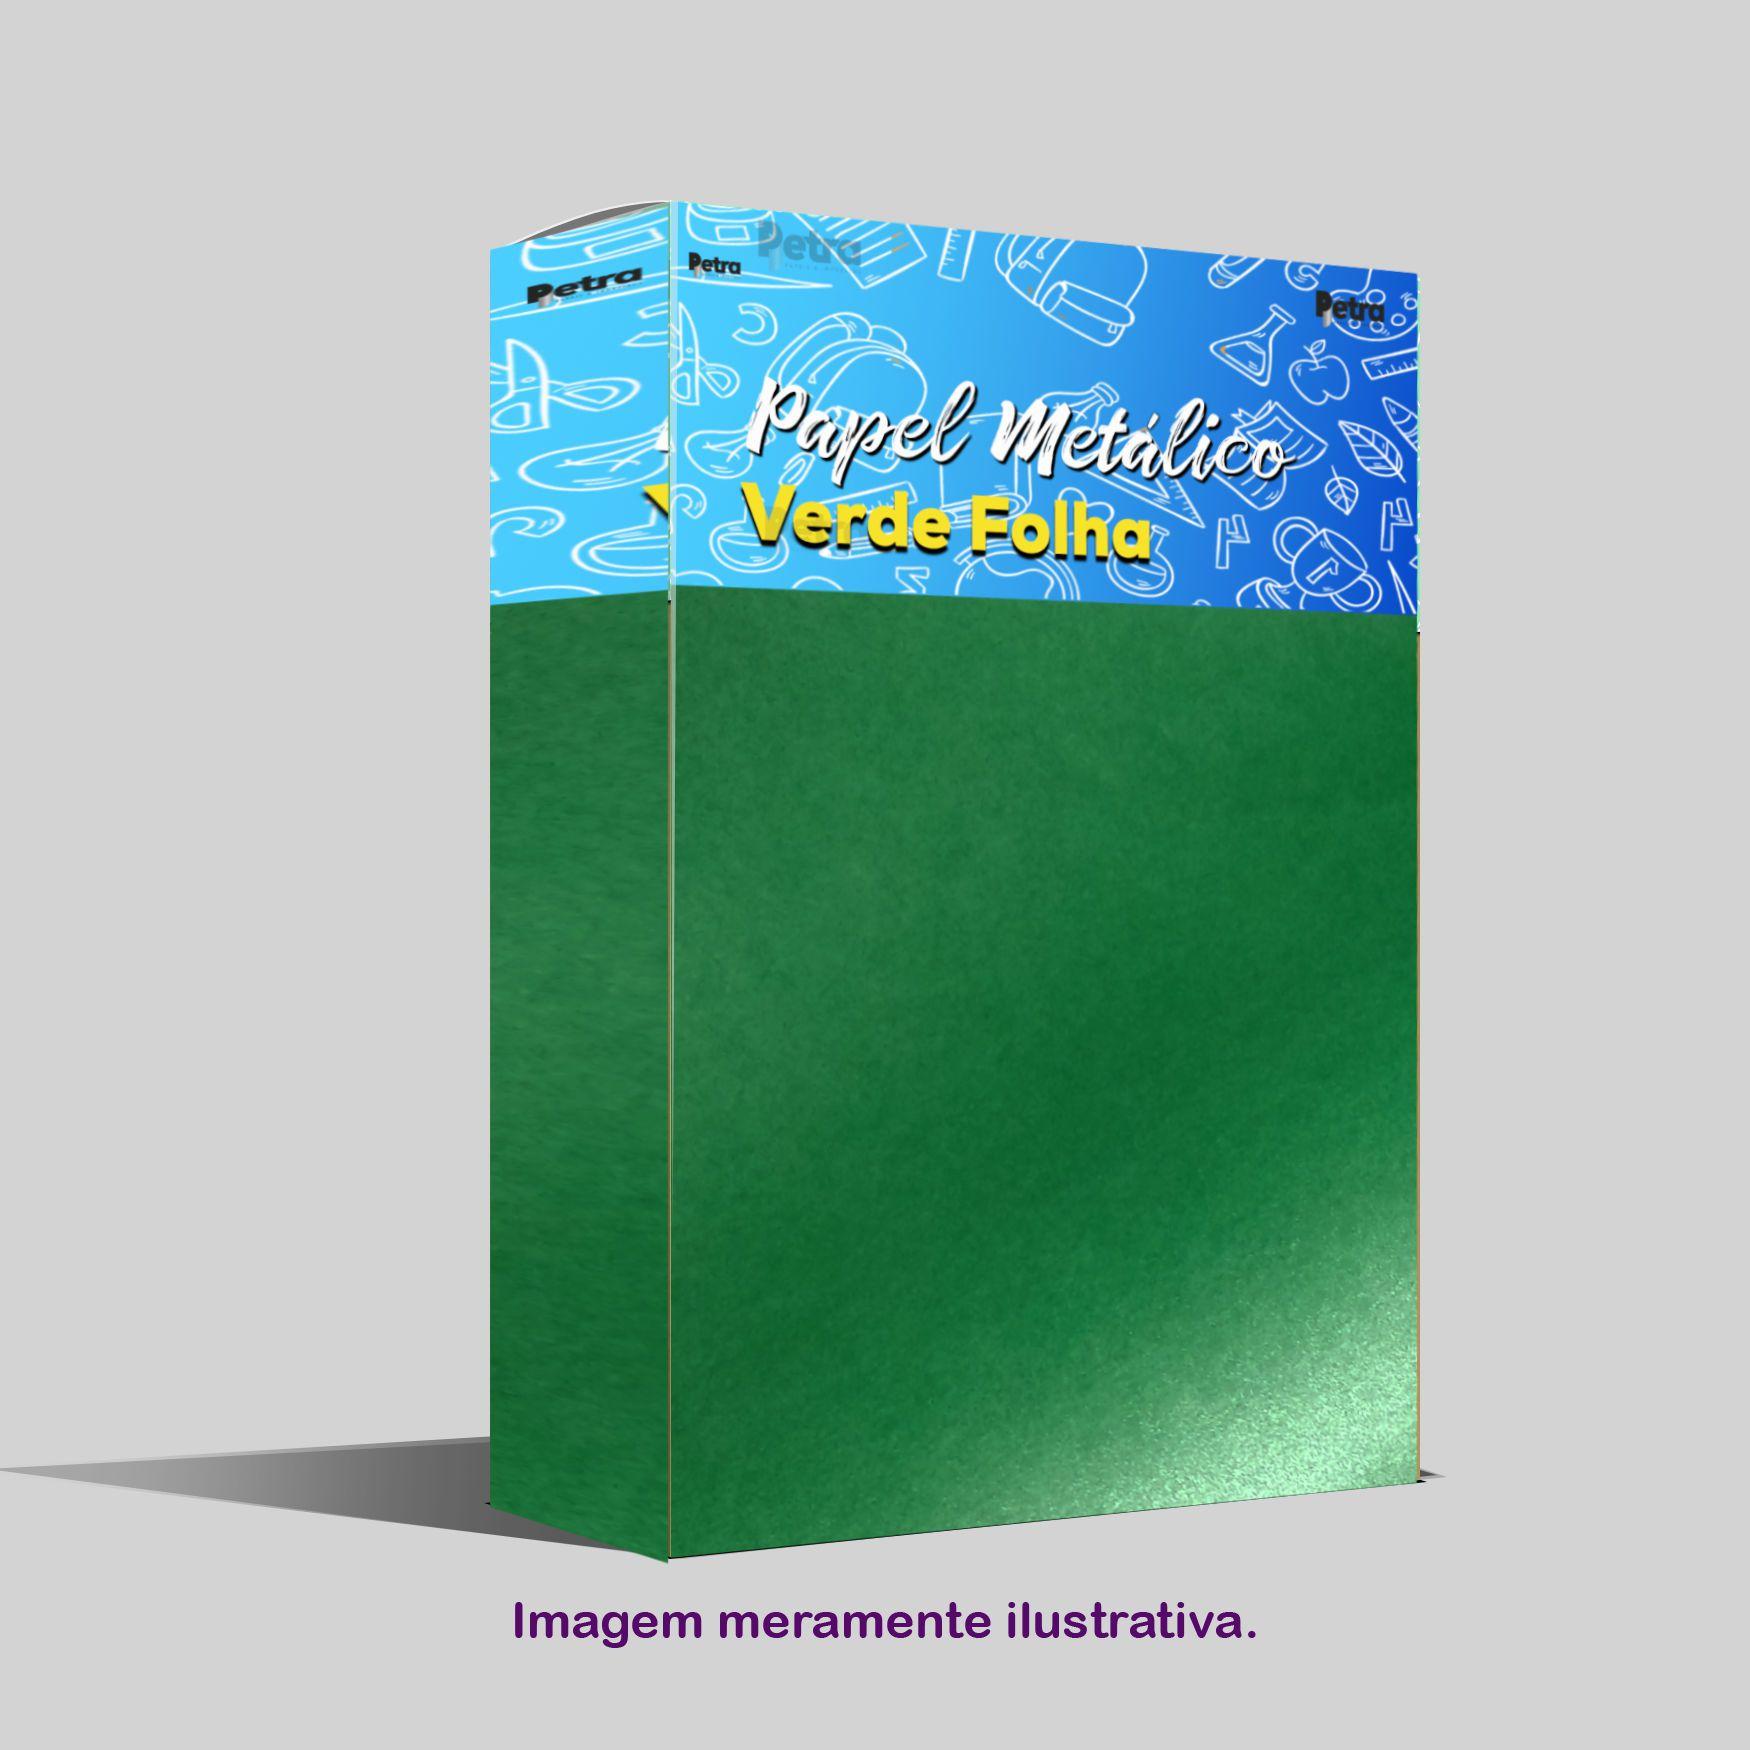 Papel Pérola Verde Folha Tam. A3 - 180g/m²